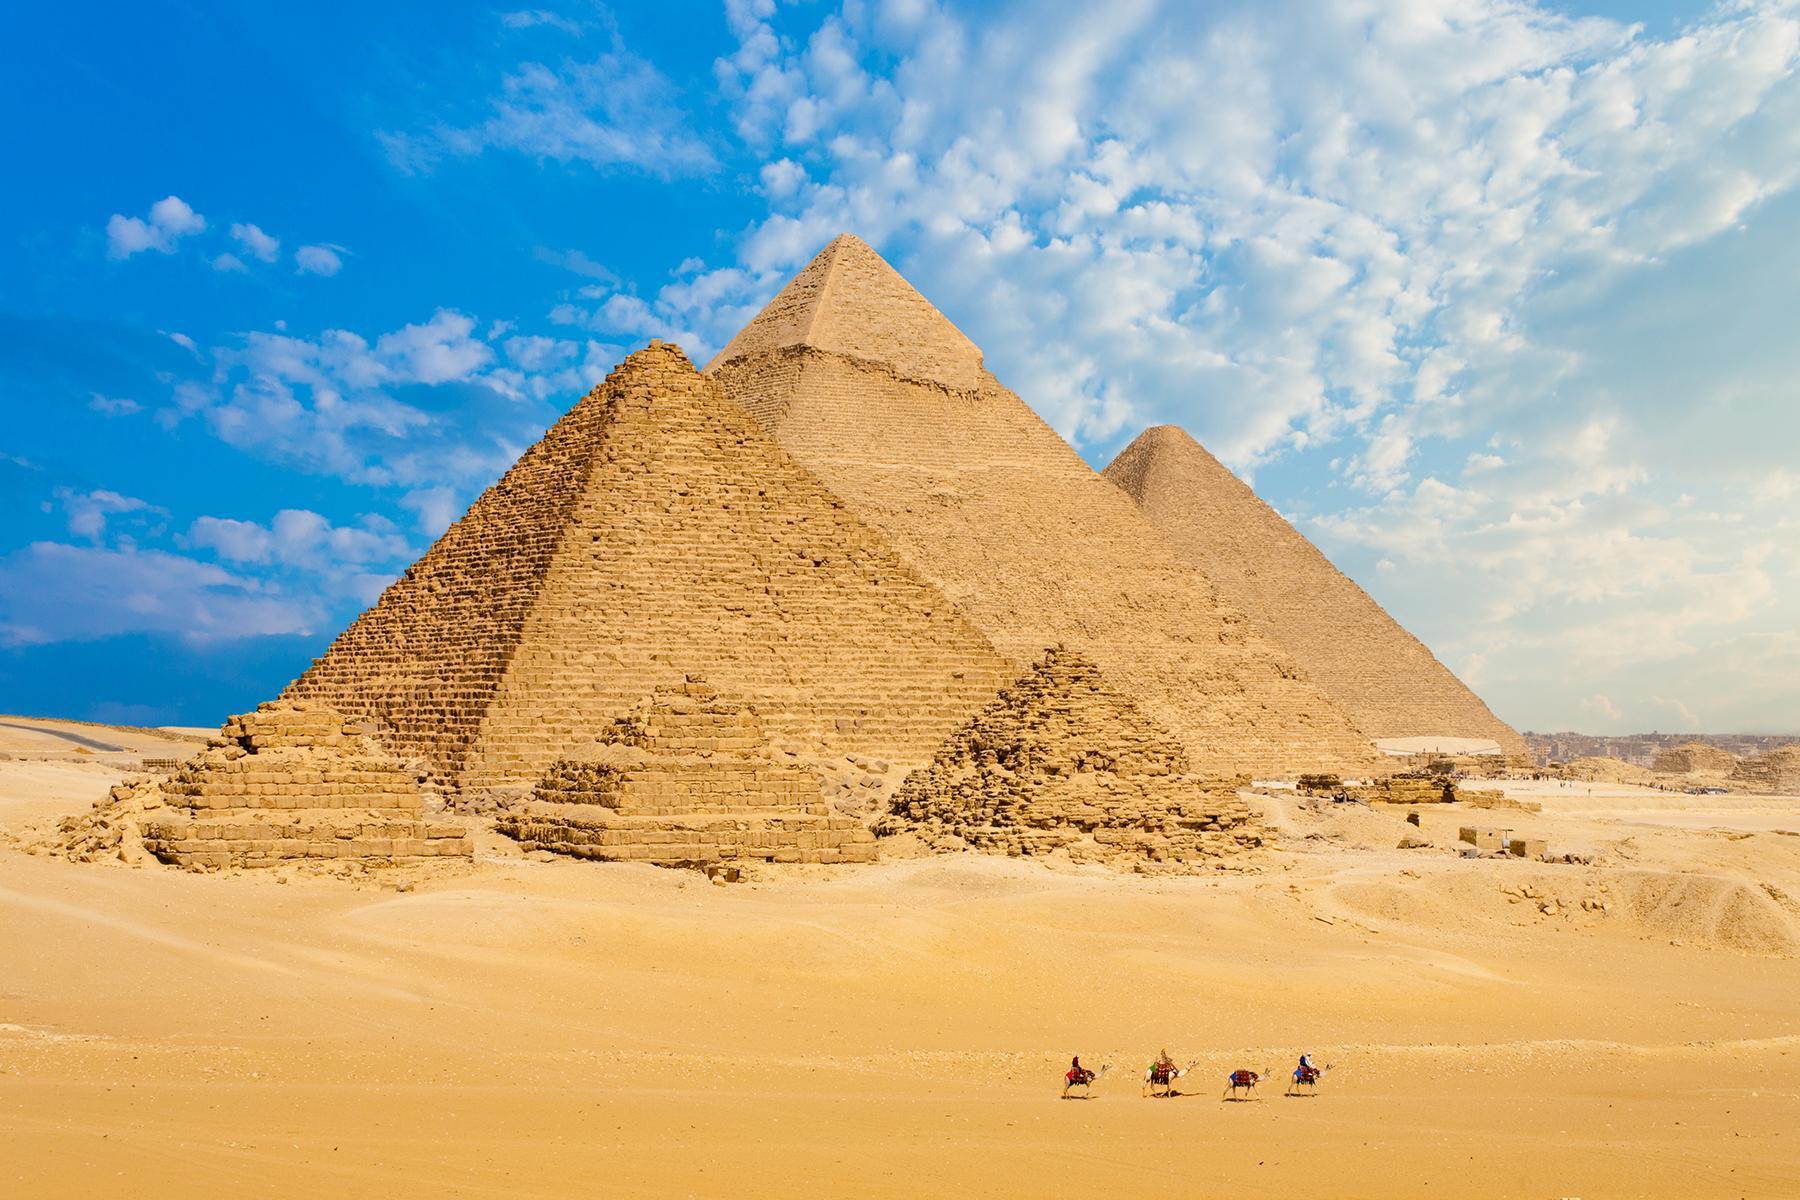 10_FamilyBackdrops__PyramidsofGiza_shutterstock_511451116